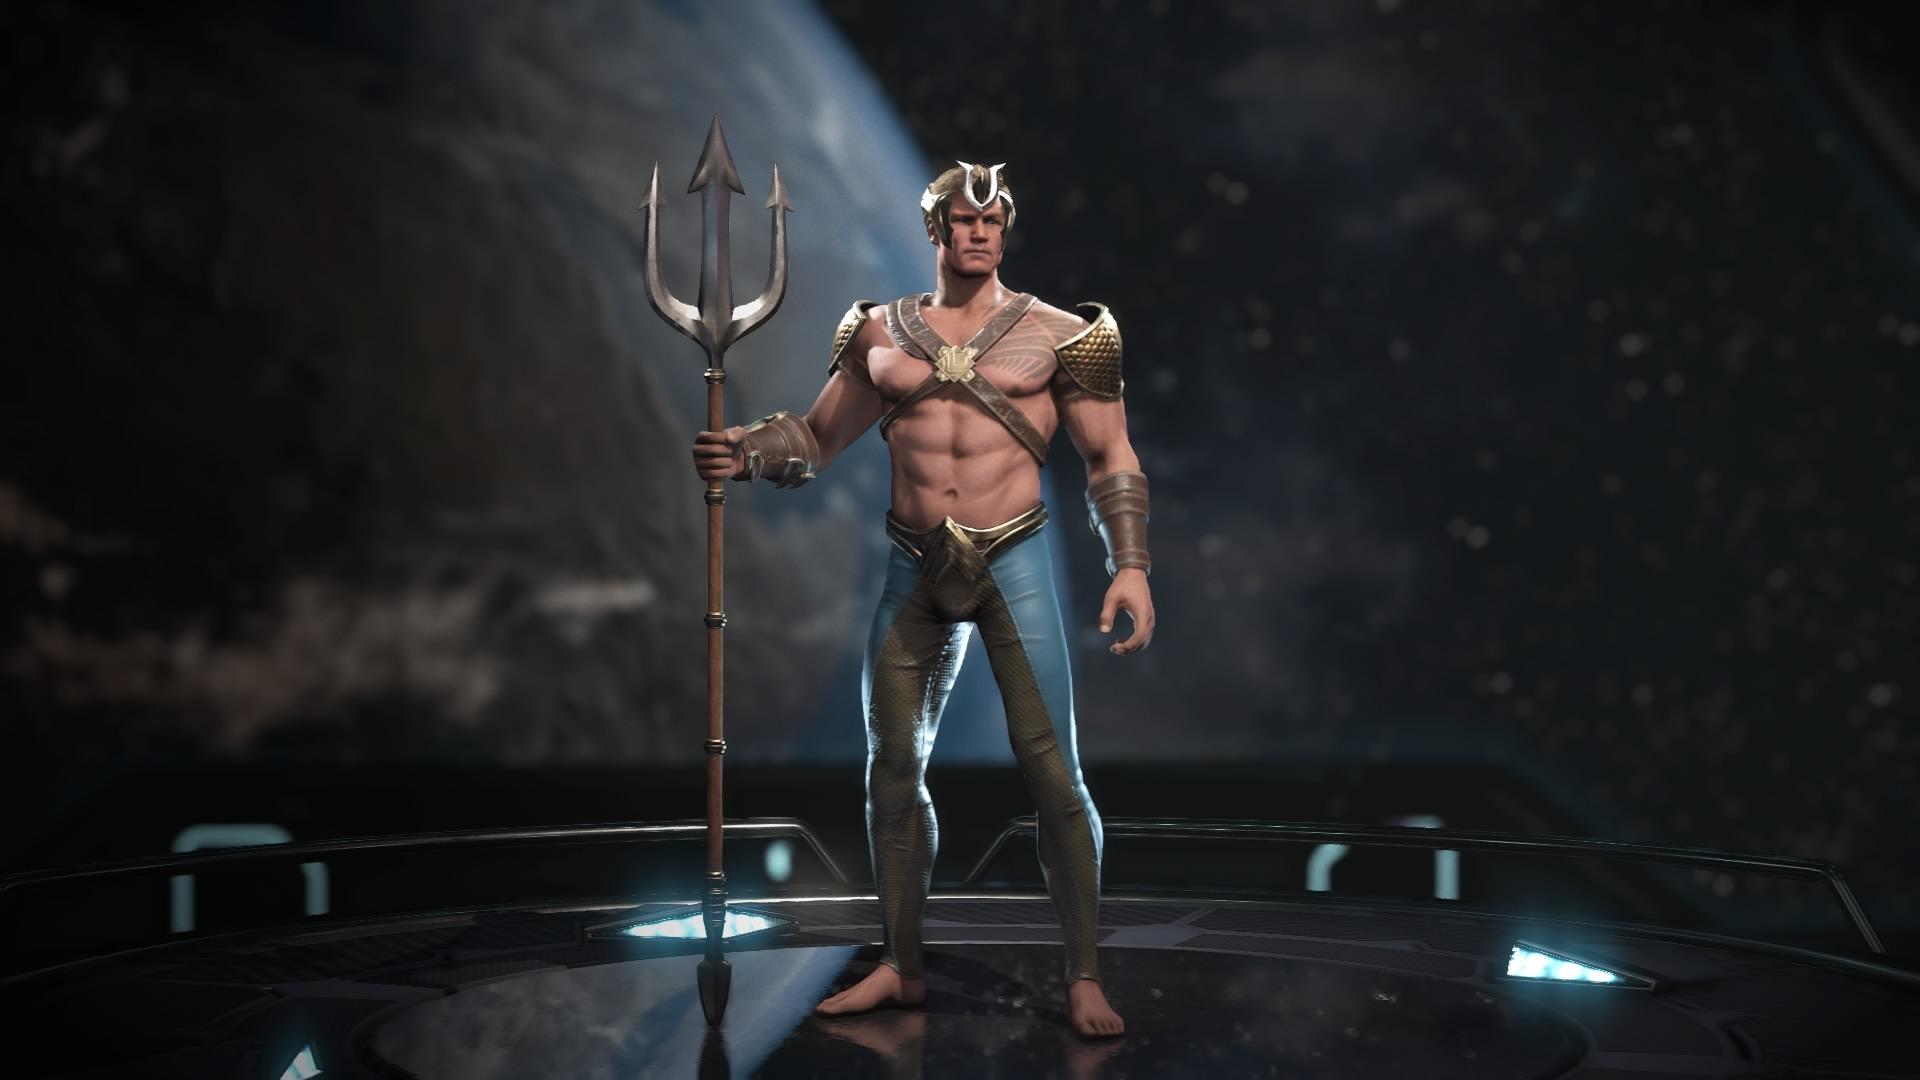 Aquaman (Knight of Justice)